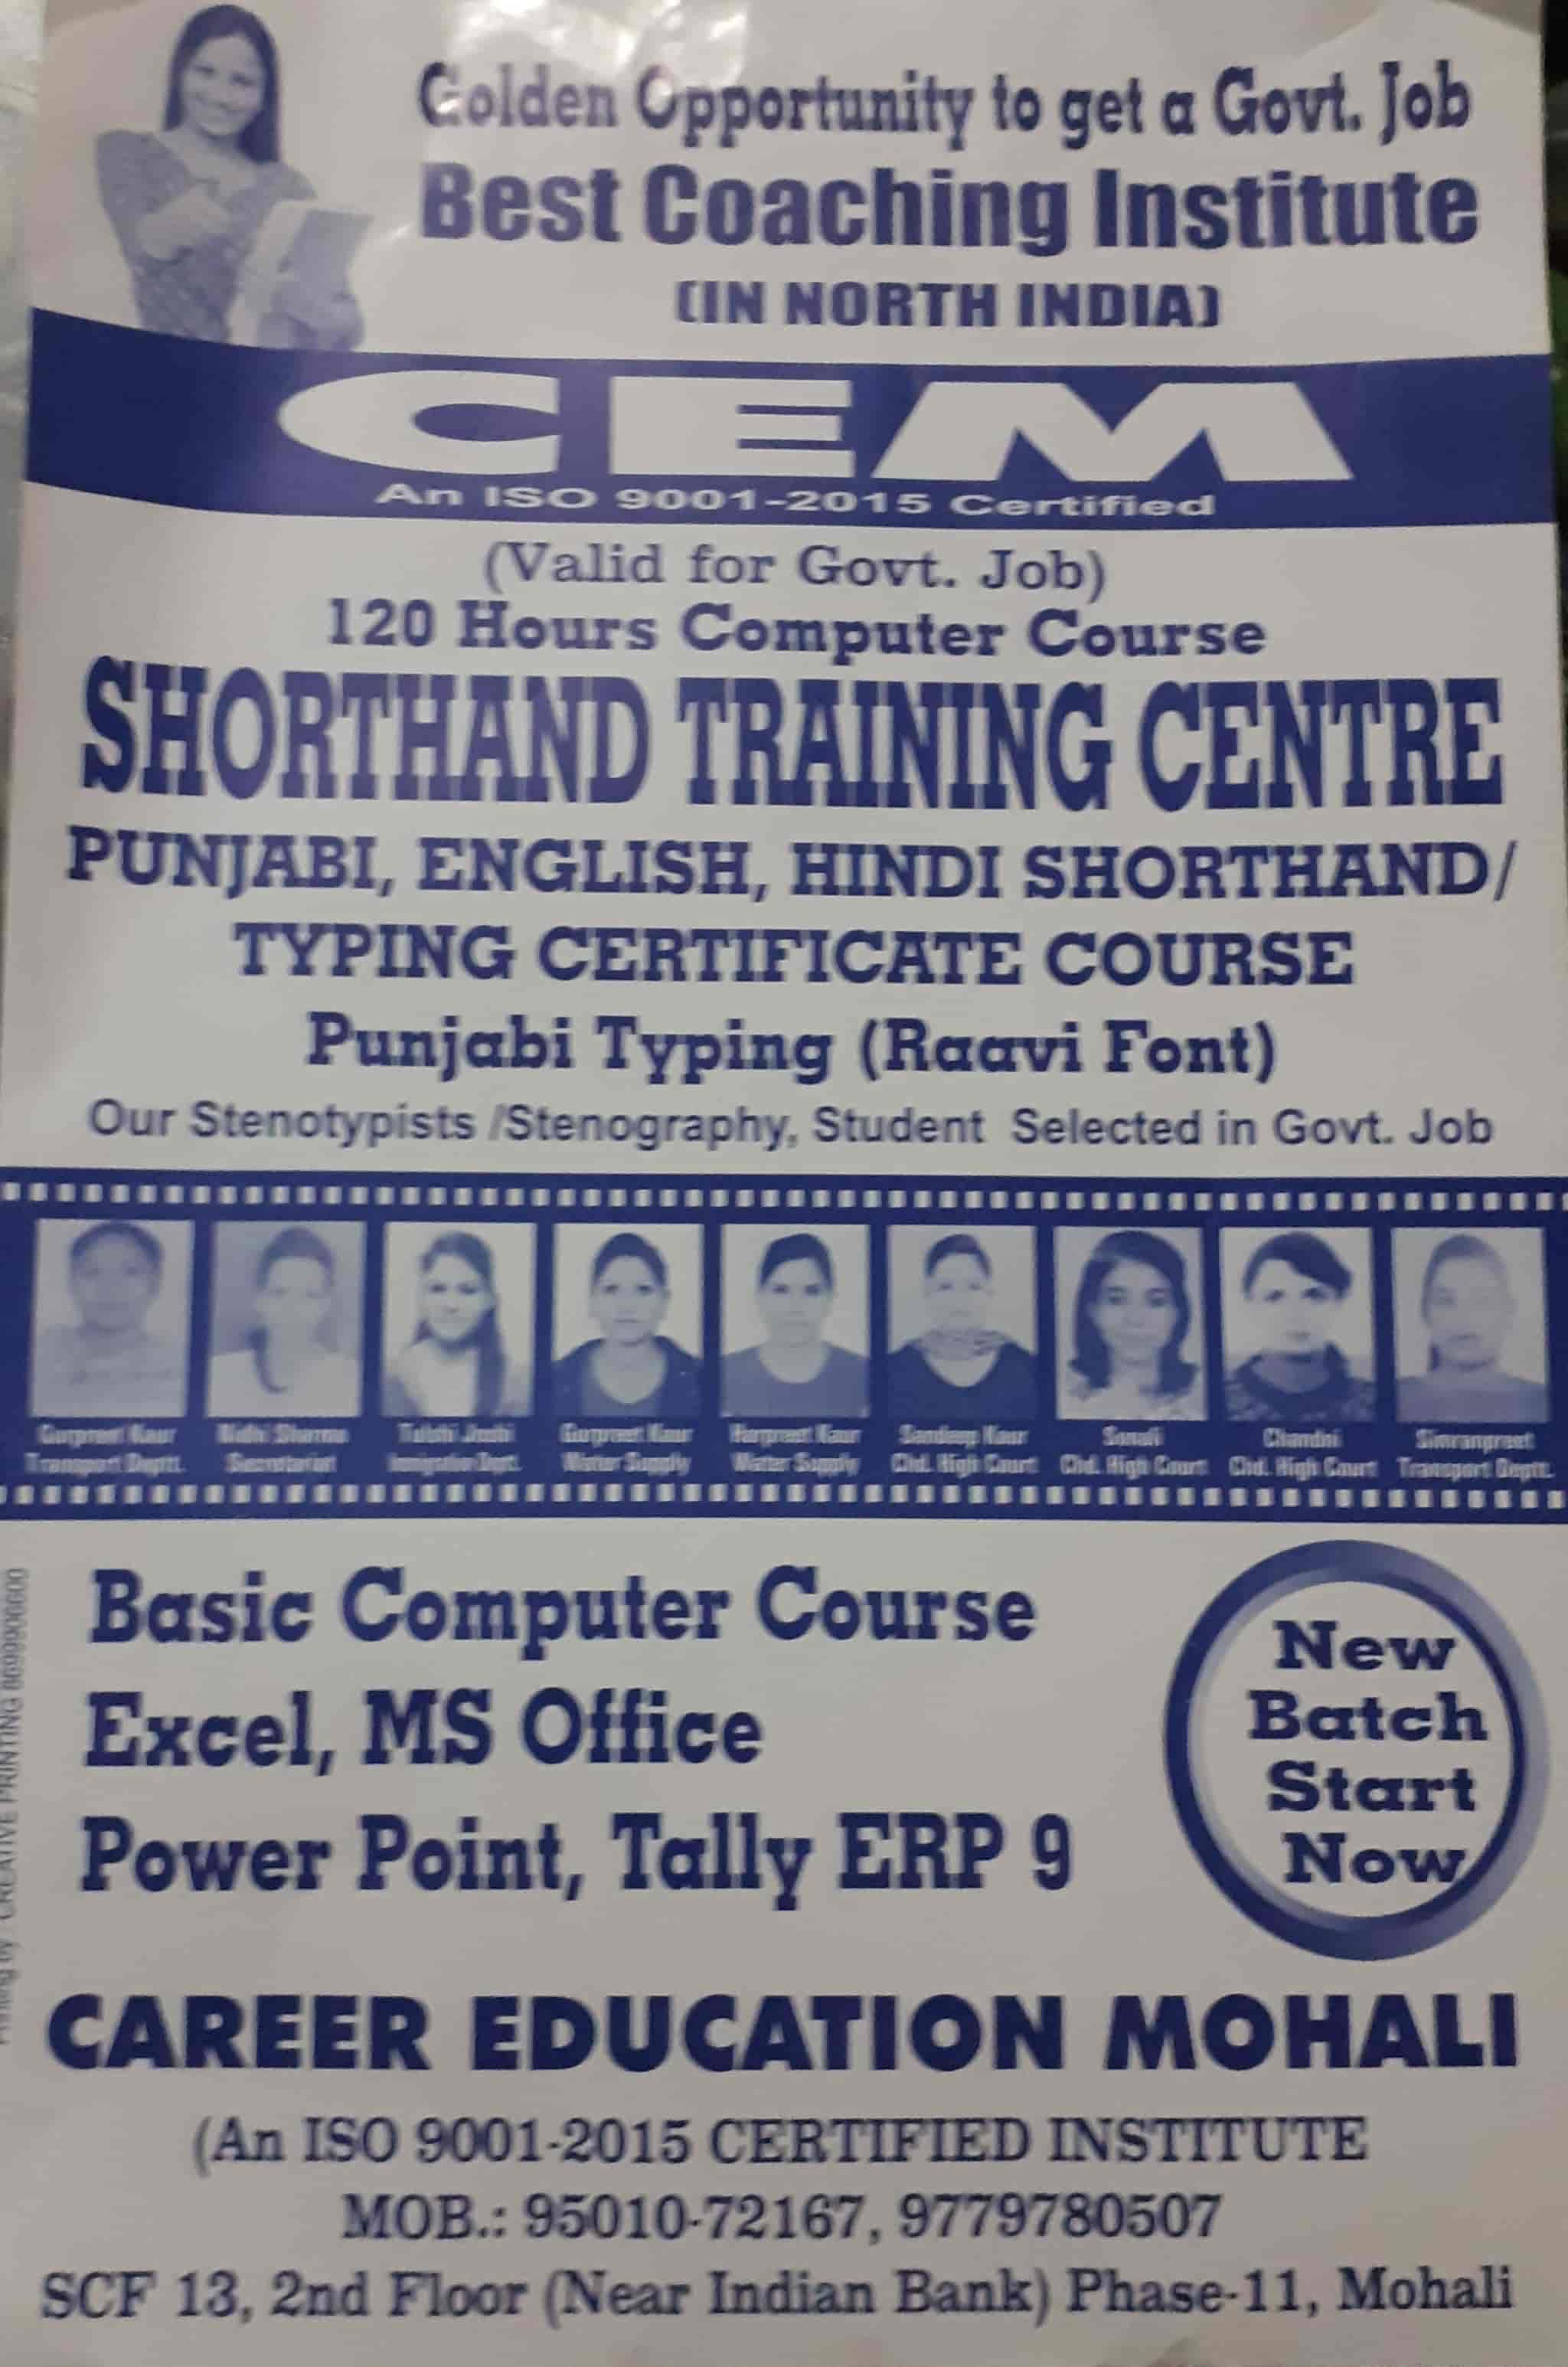 Shorthand Classes Phase 11 - Tutorials in Mohali, Chandigarh